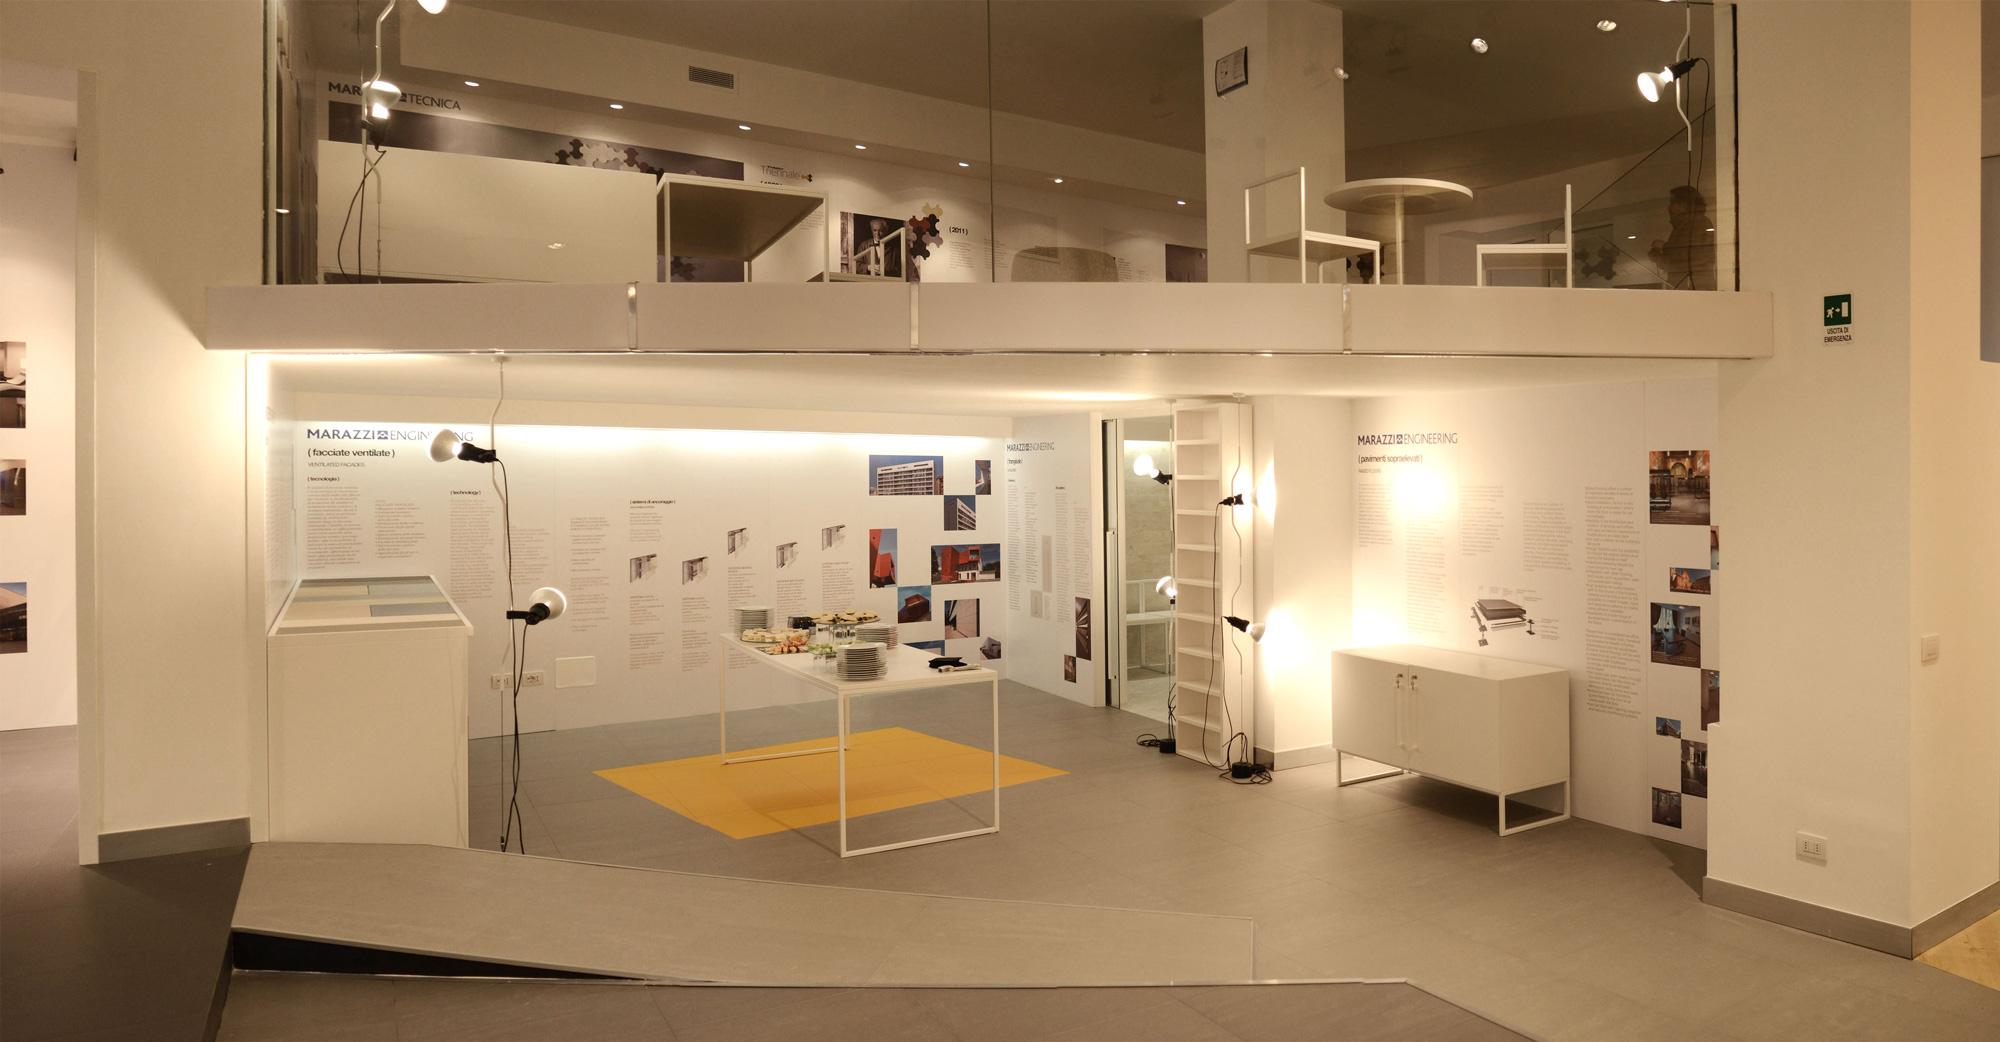 marazzi showroom in milan it uainot. Black Bedroom Furniture Sets. Home Design Ideas